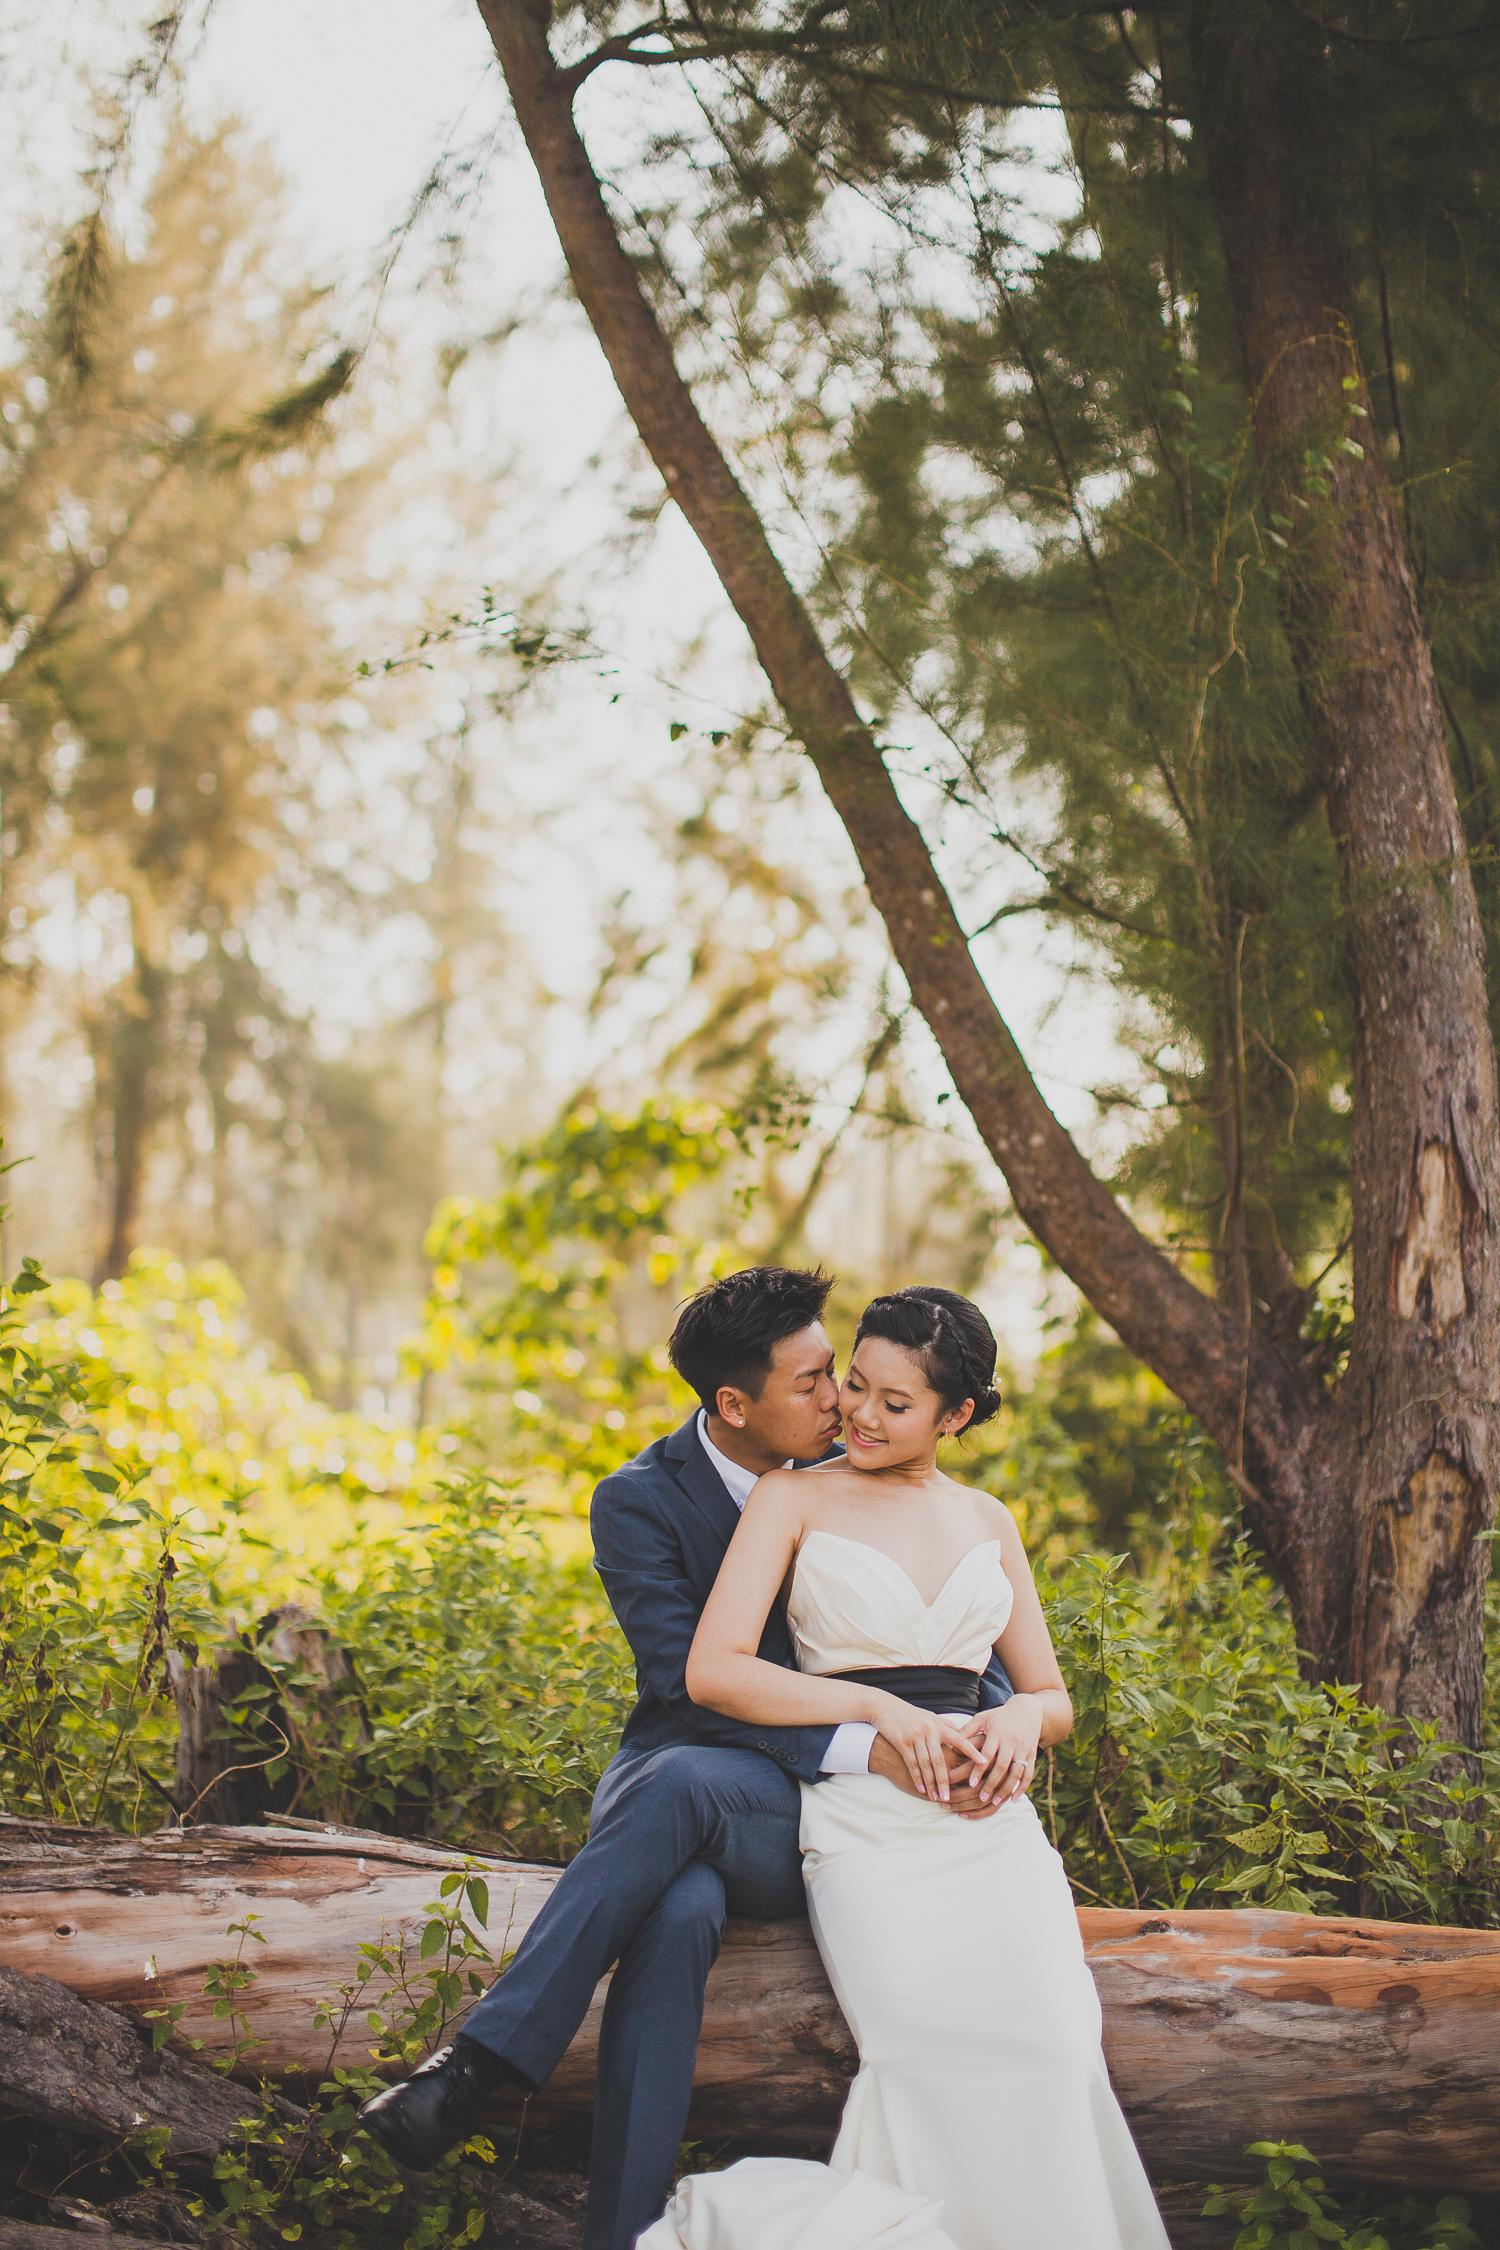 Singapore+Pre+Wedding+Photographer+Ziyang+Clara-0026.jpg